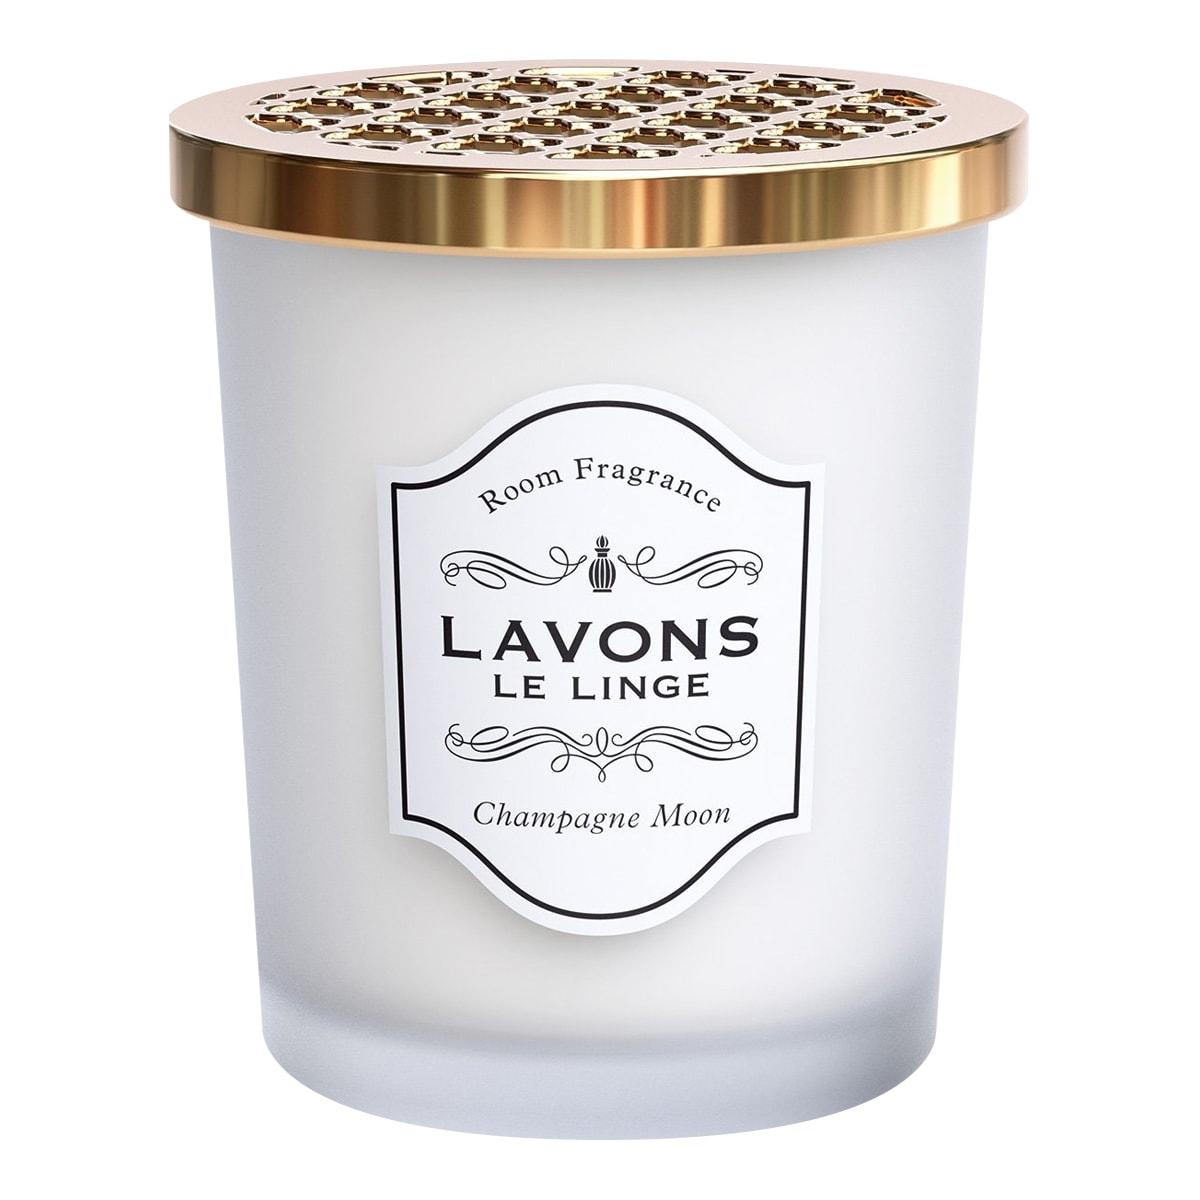 LAVONS LE LINGE Premium Room Aroma Fragrance Gel Deodorizer Champagne Moon 150g